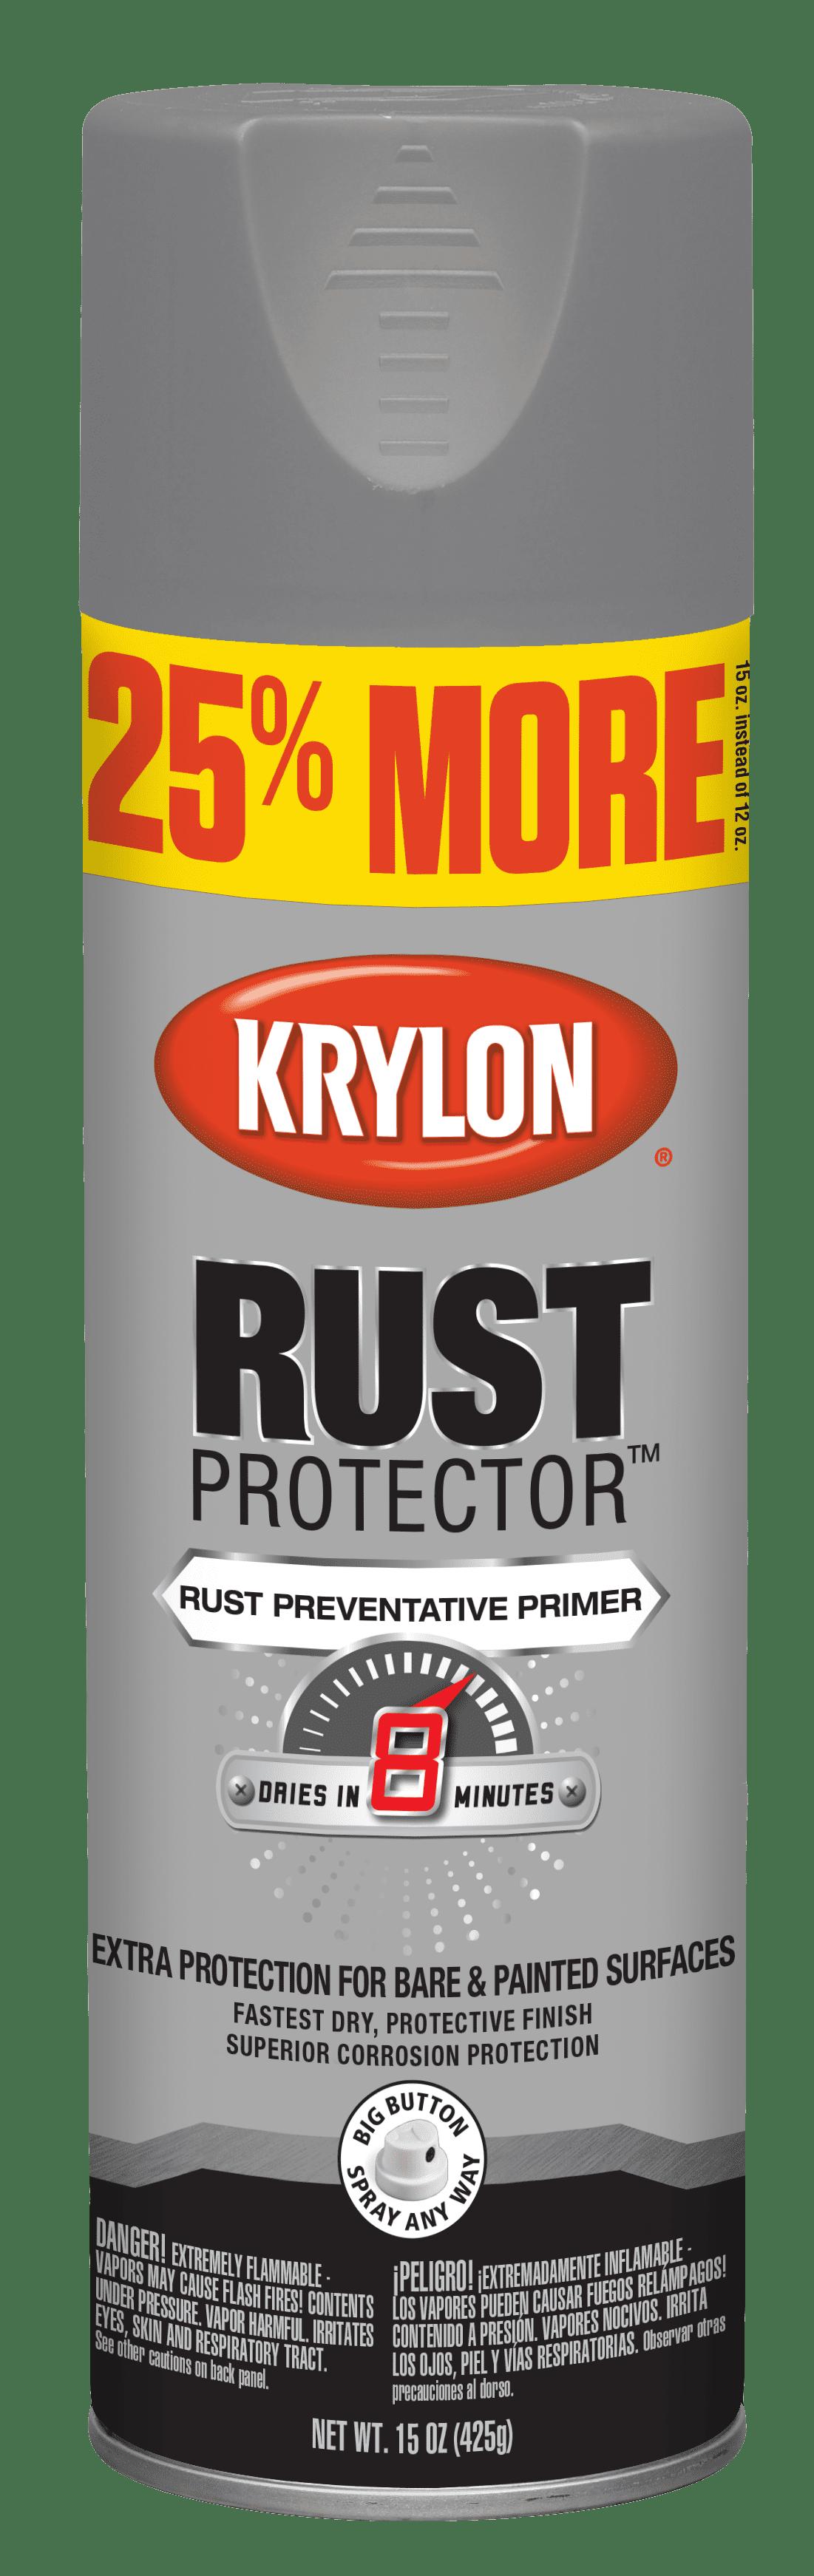 krylon rust protector gray primer 15 oz walmart Krylon Spray-Paint krylon rust protector gray primer 15 oz